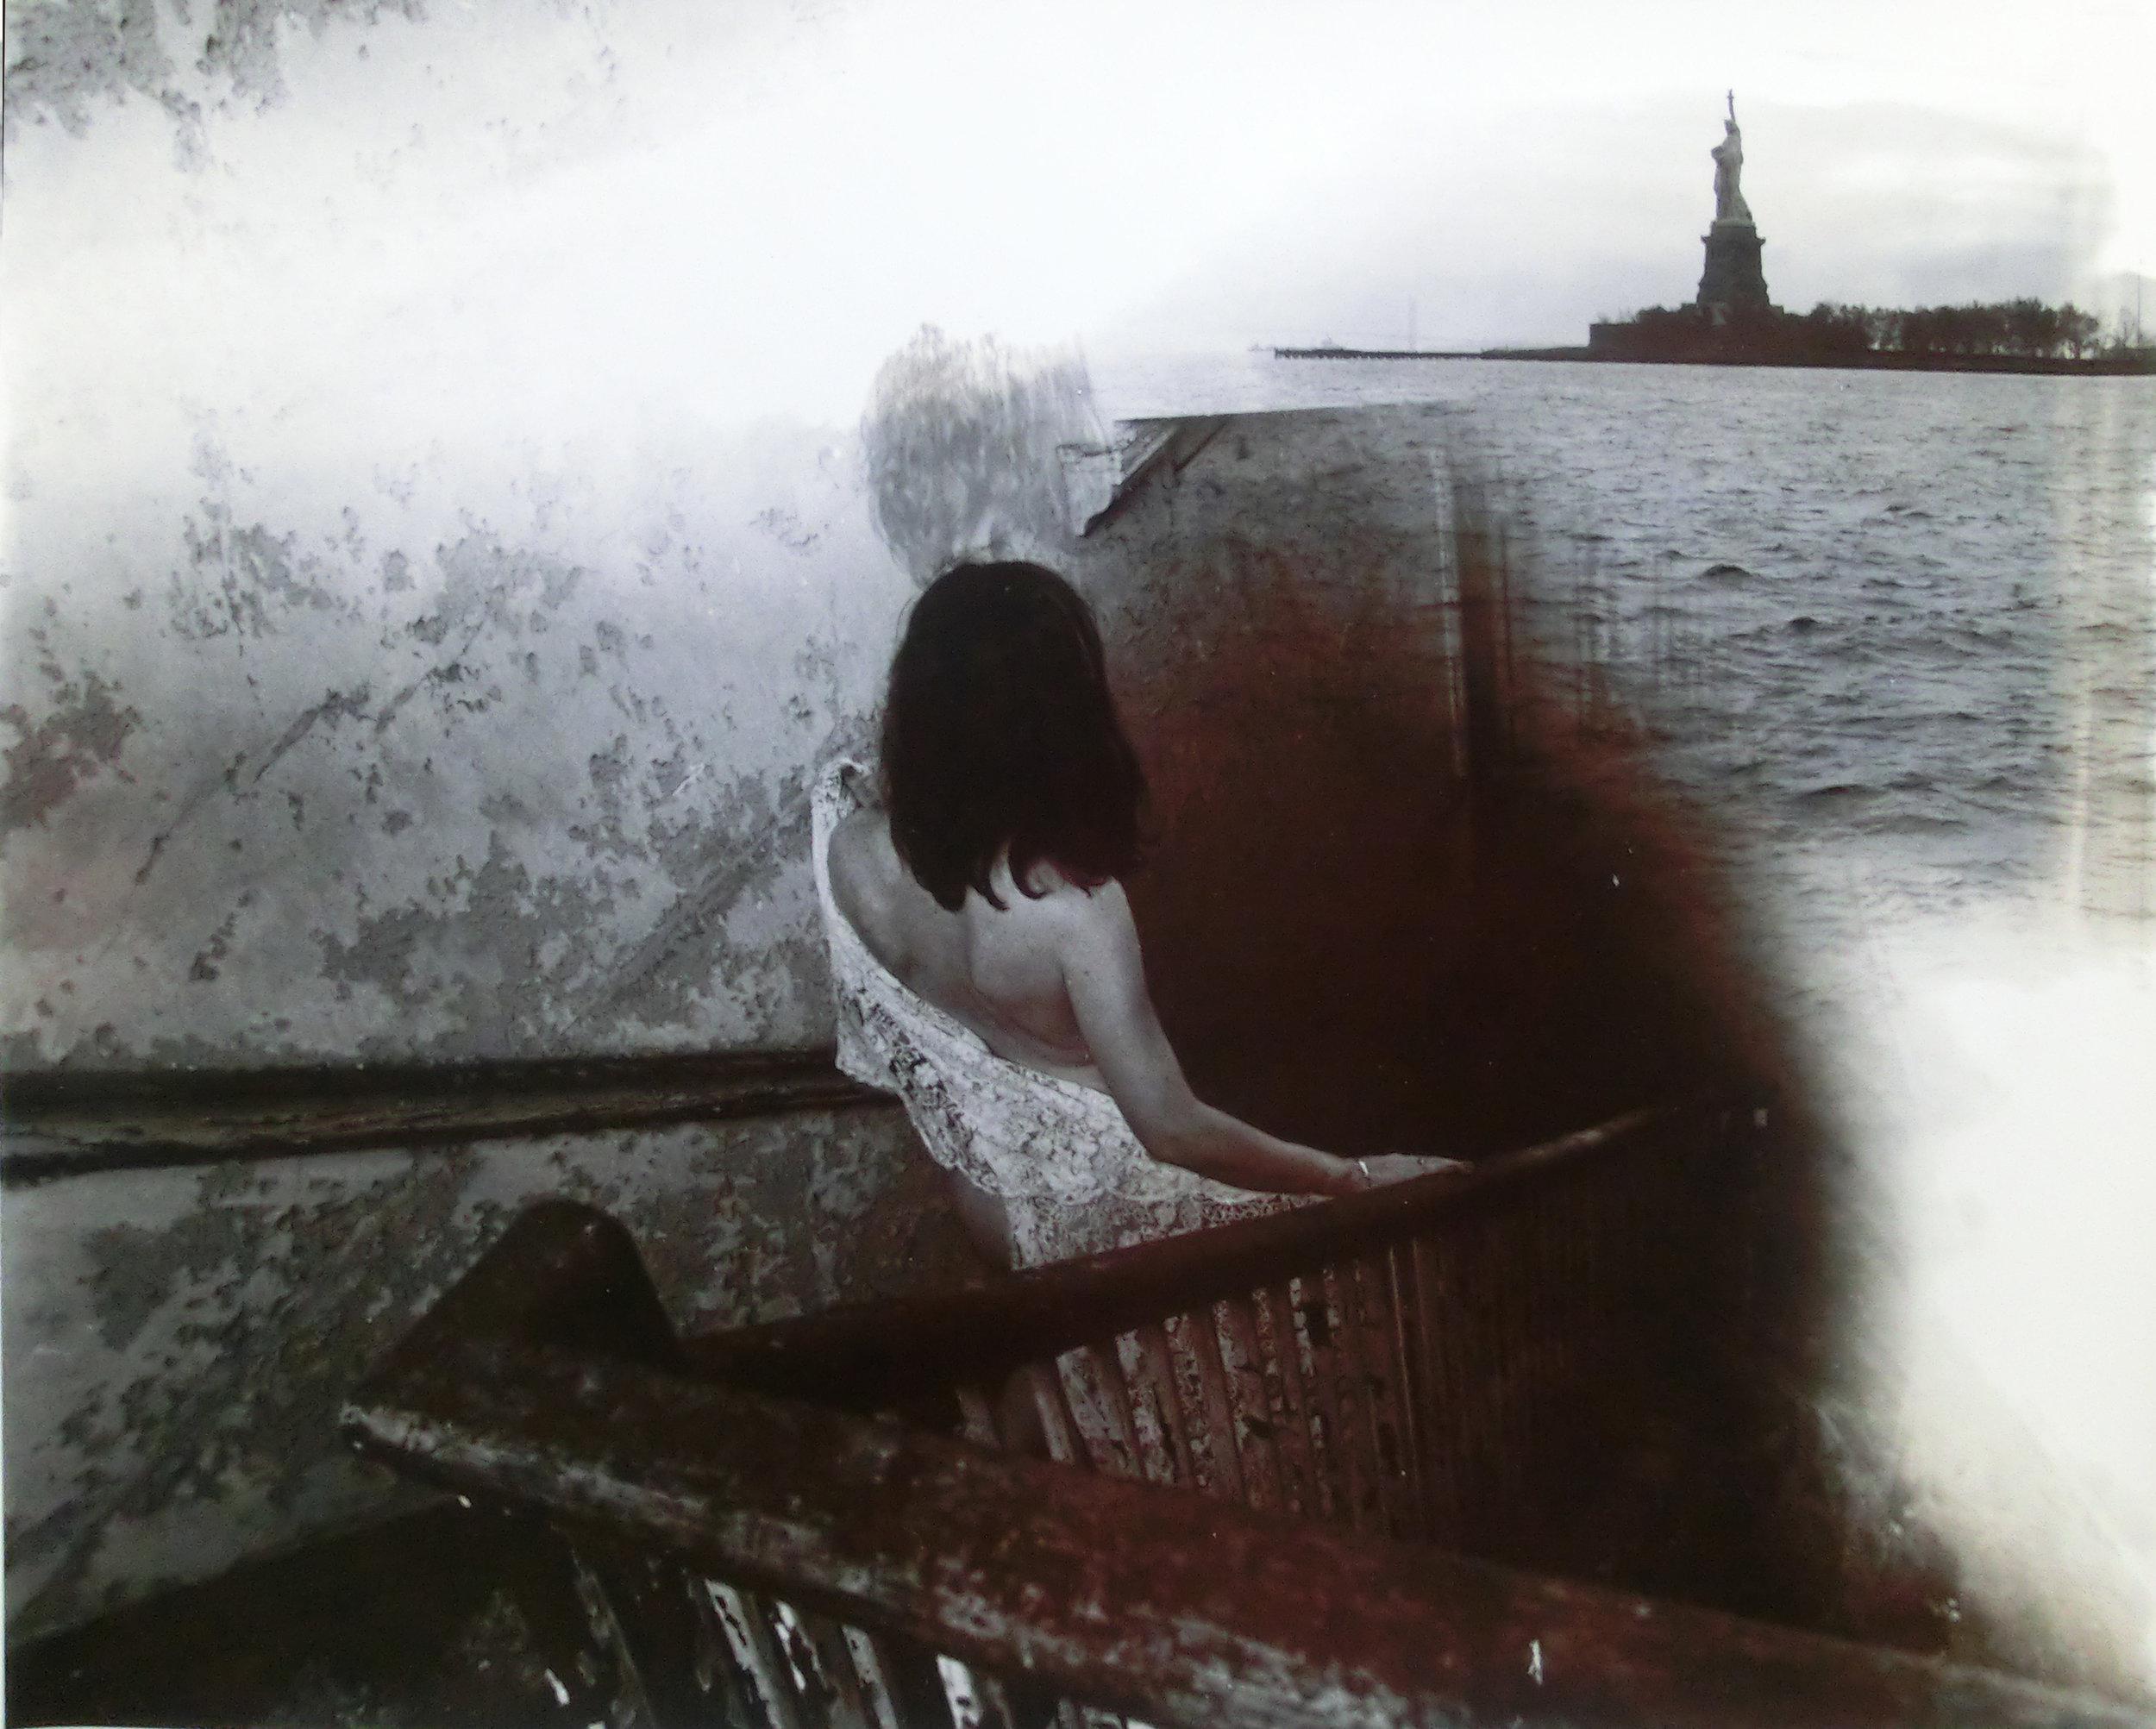 Loren Ellis 11 by 14 in 300 DPI Liberty of her throne 2 0f 2 Ellis island series.jpg